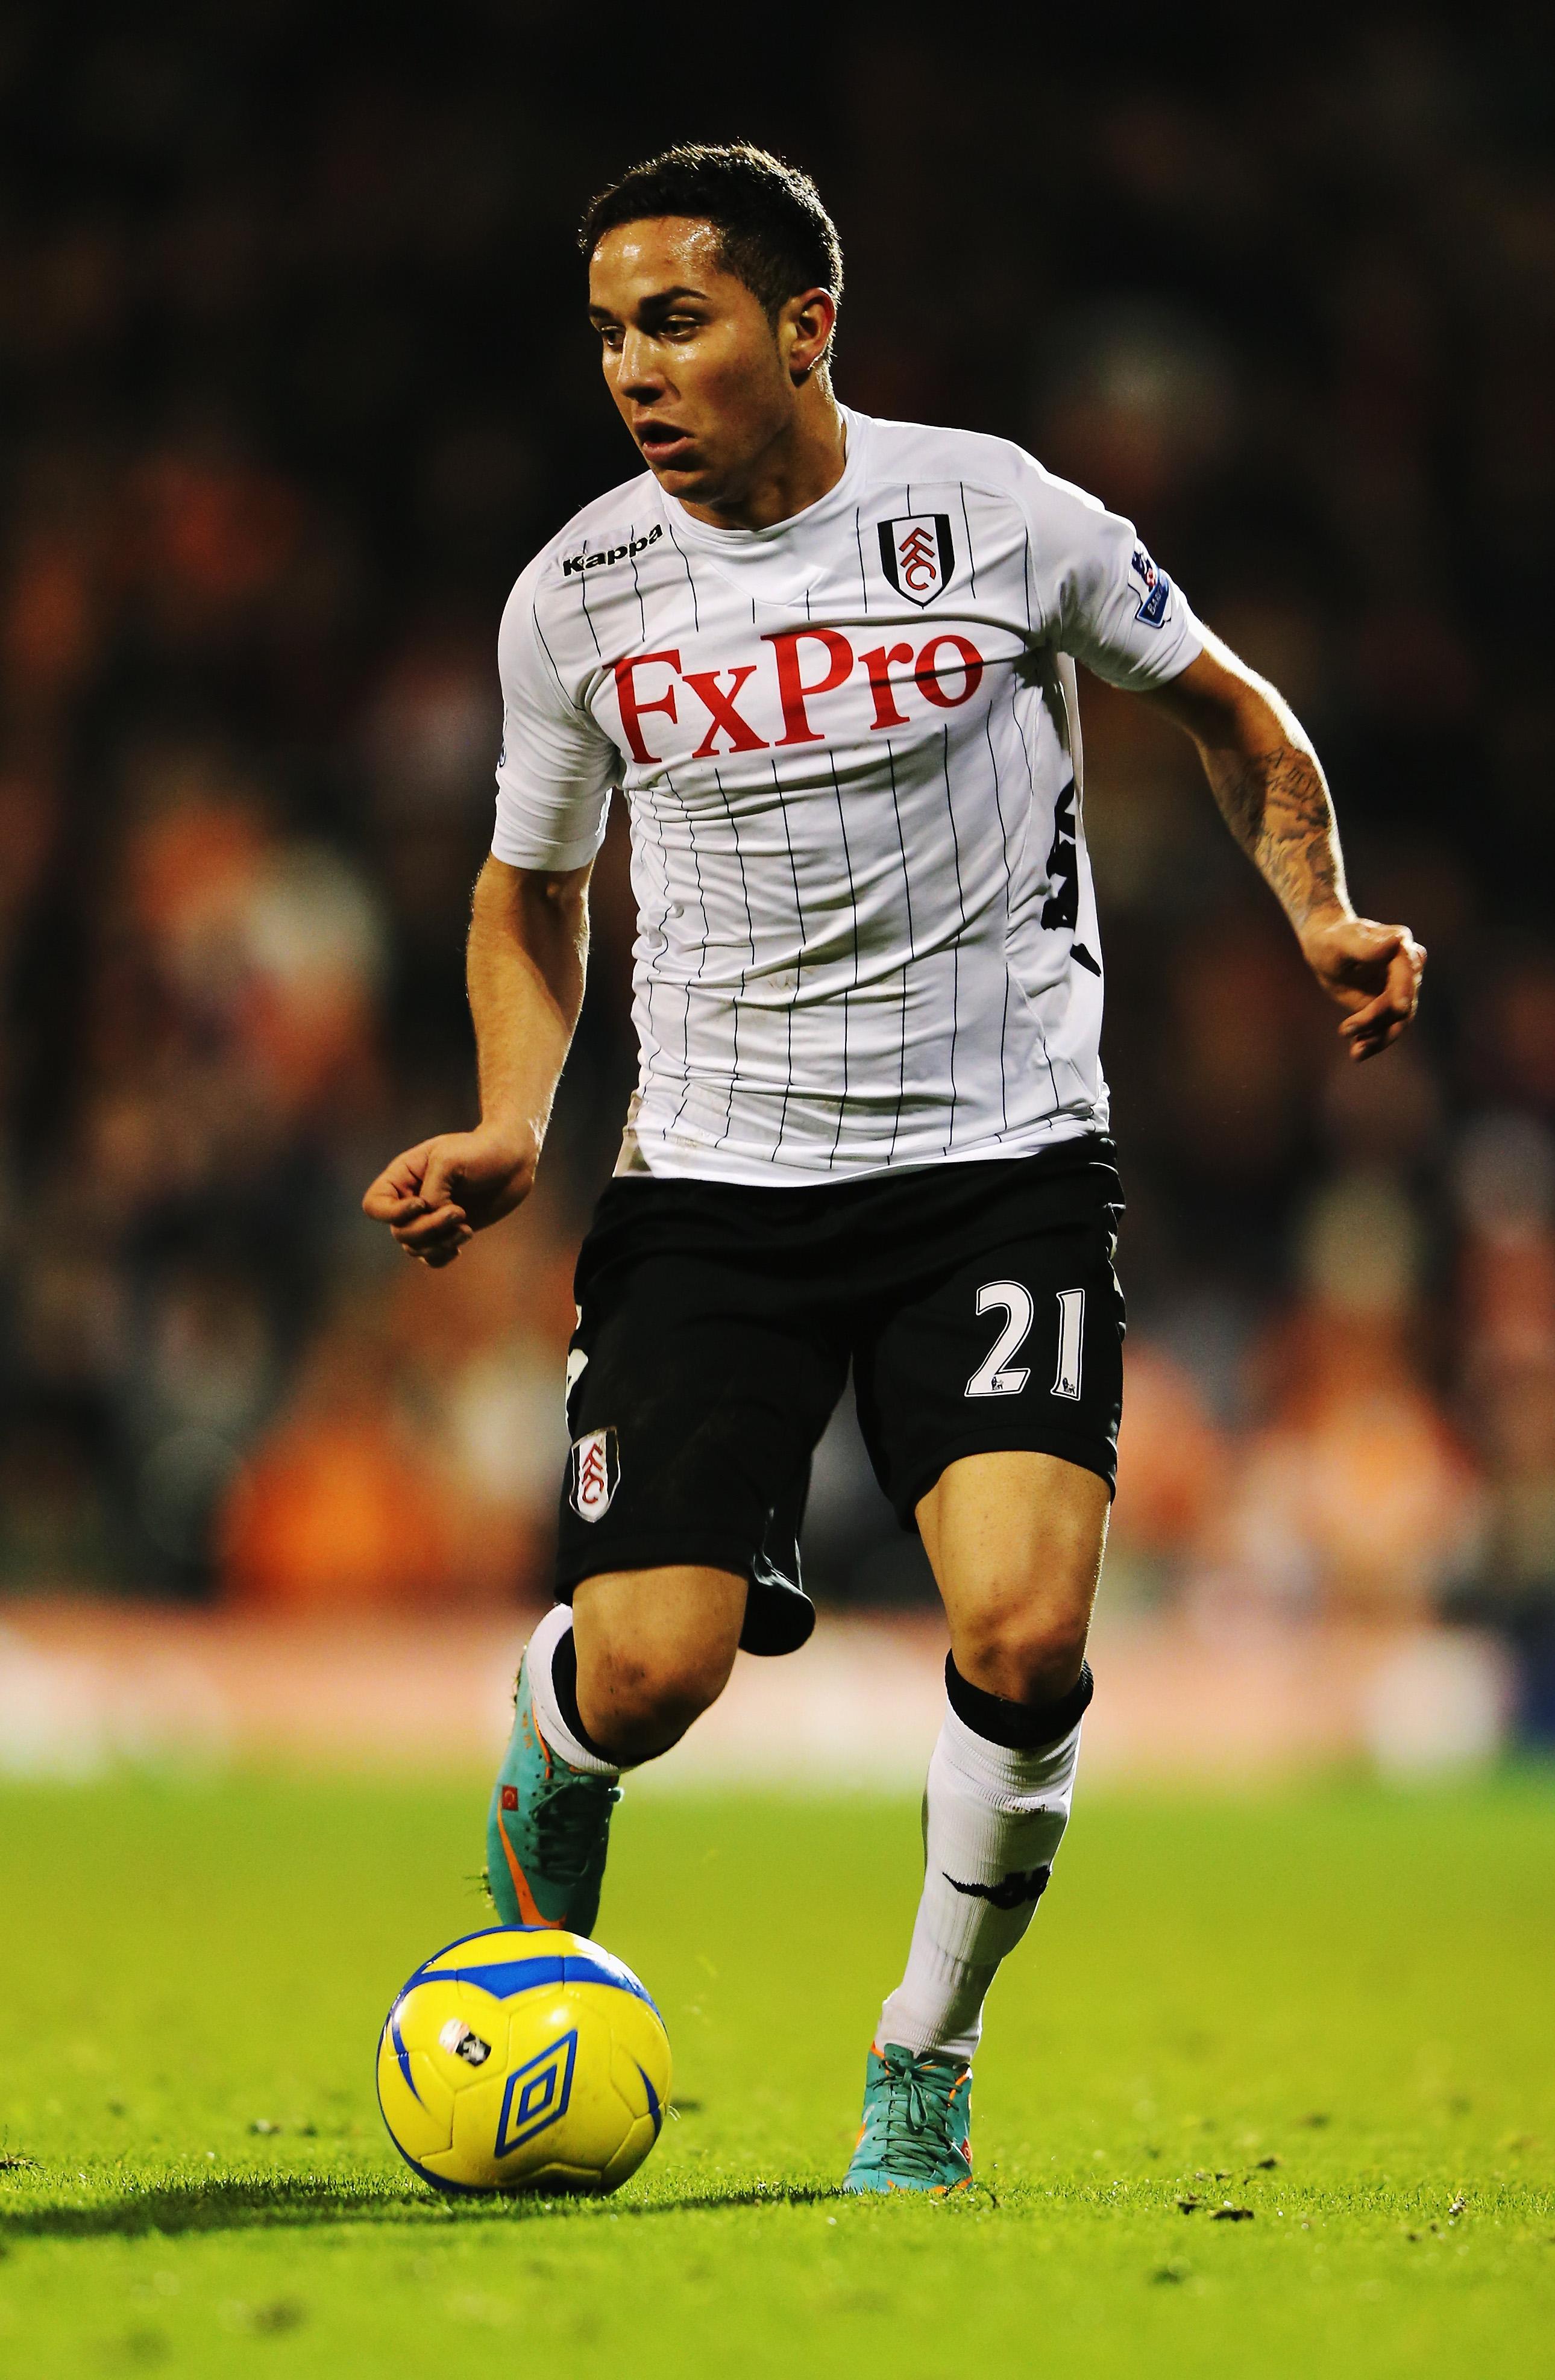 Besiktas confirm talks with Fulham over signing winger Kerim Frei